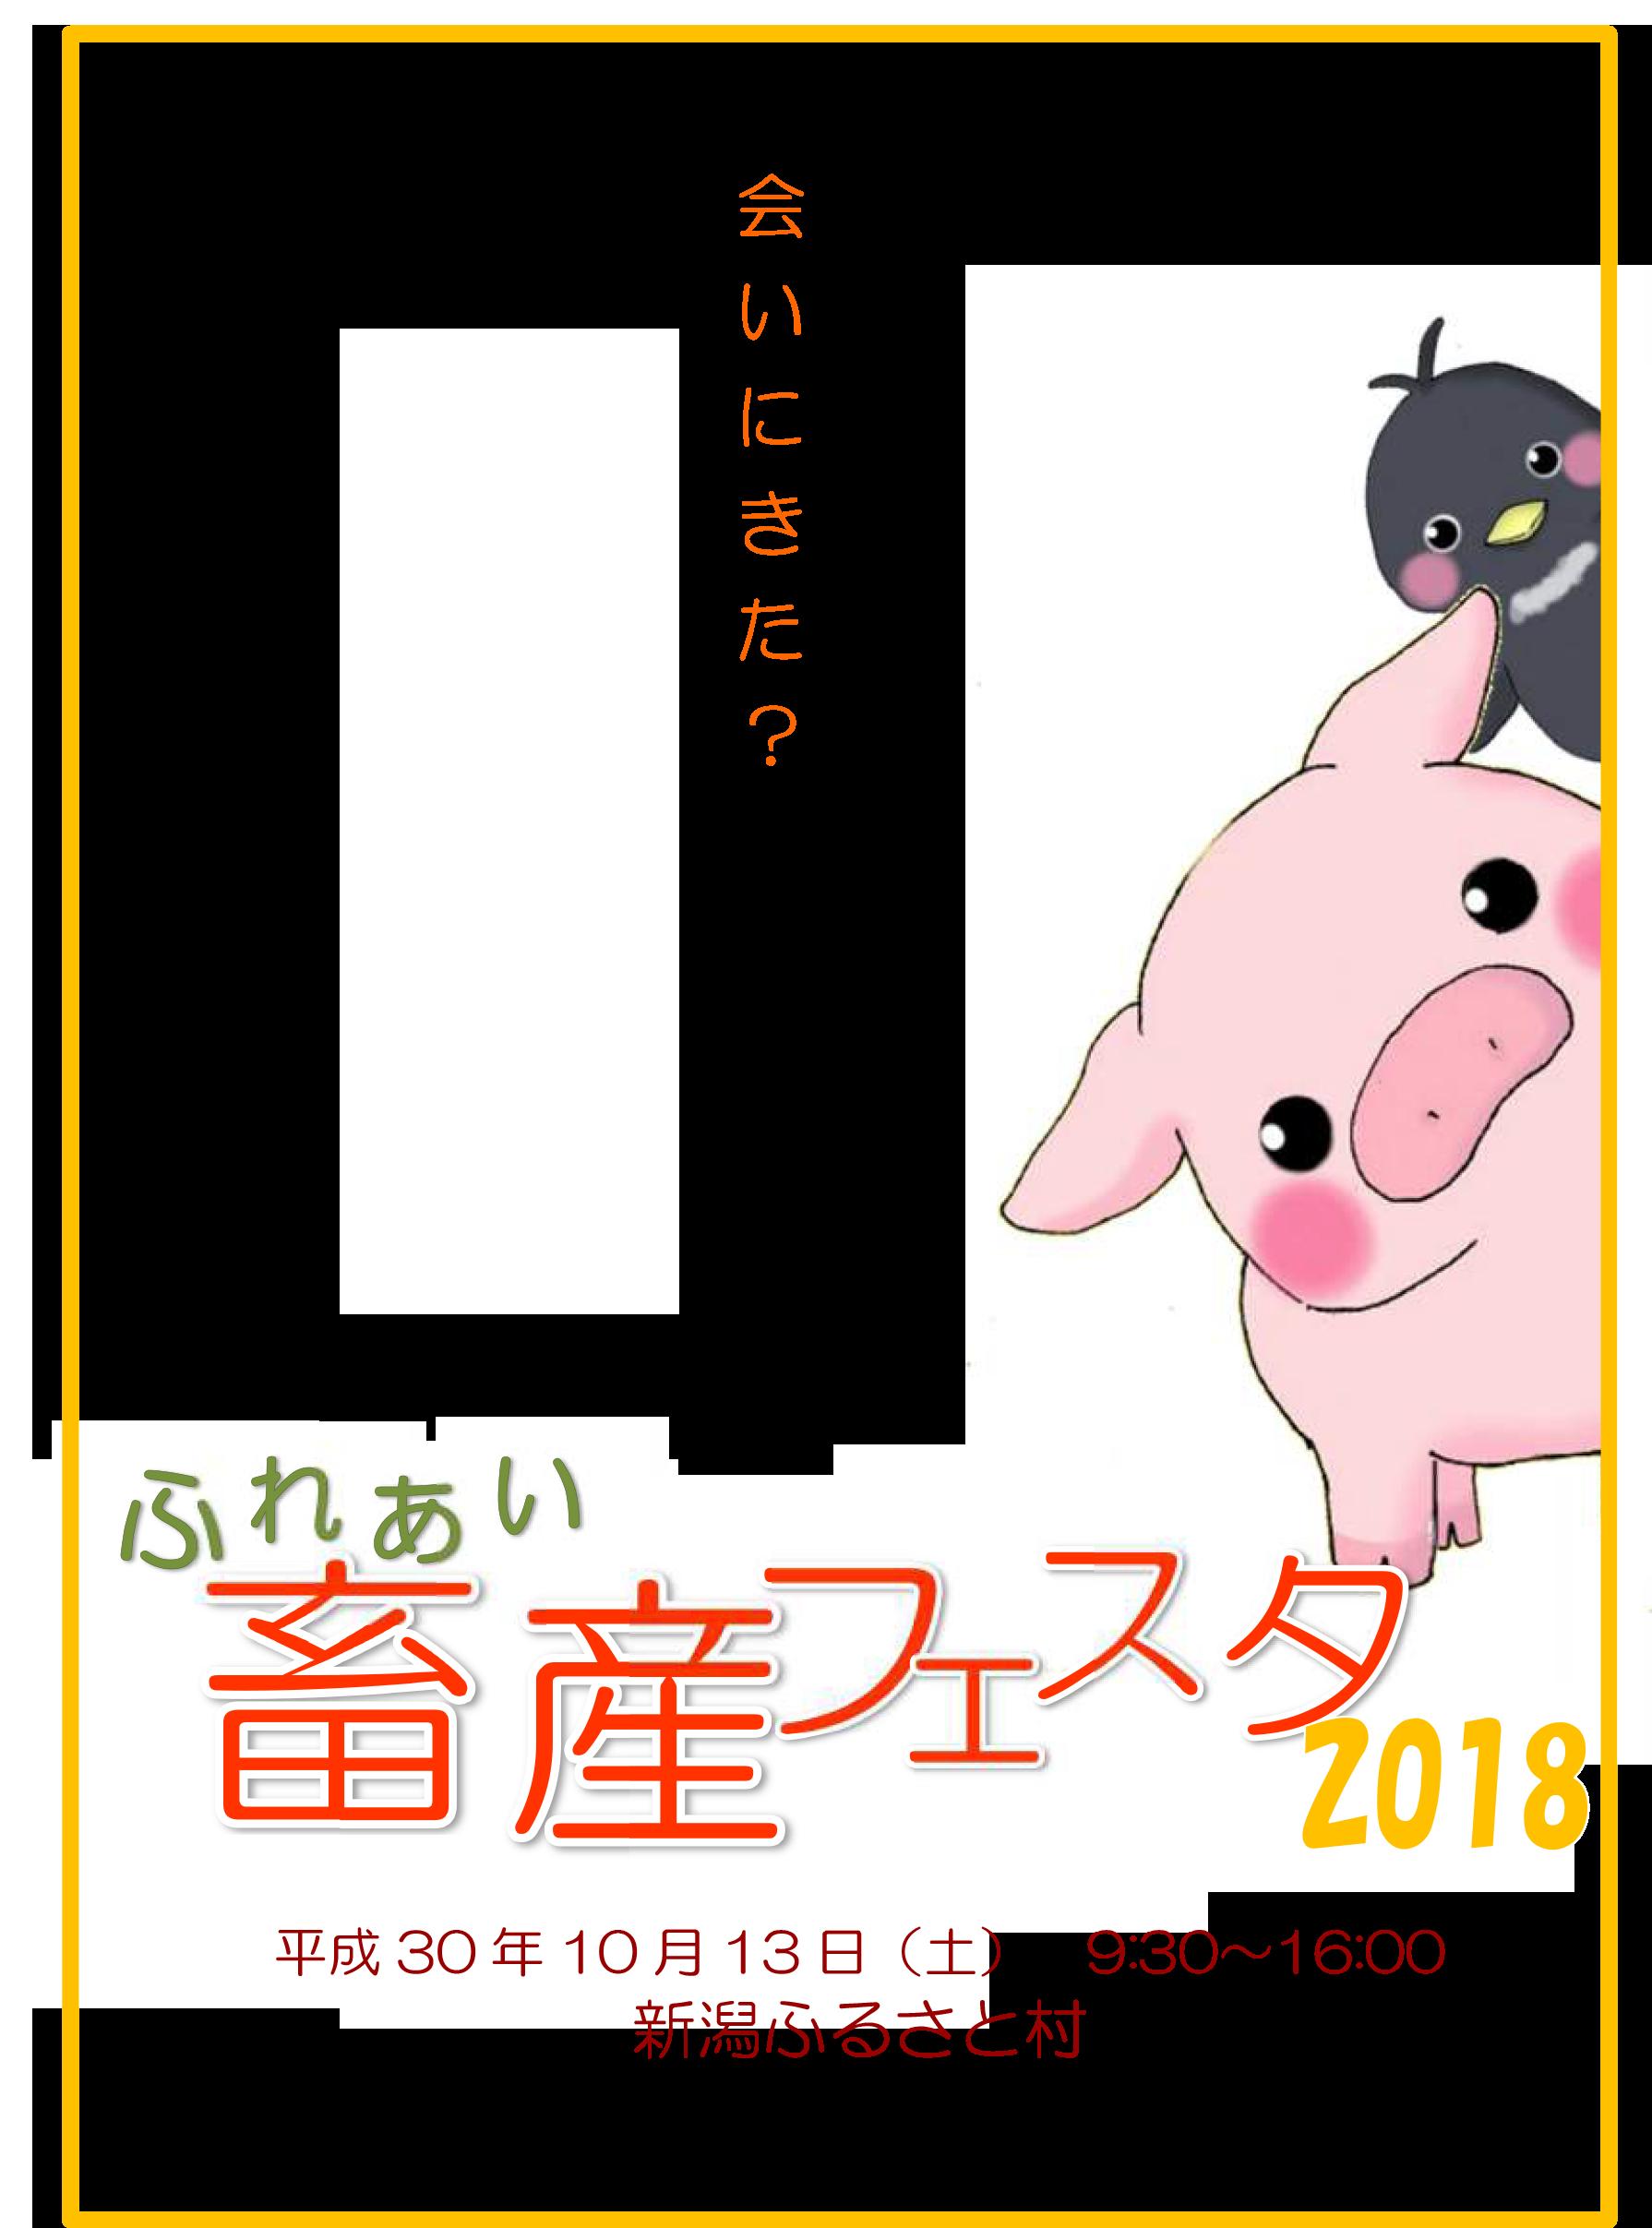 img2_20181011